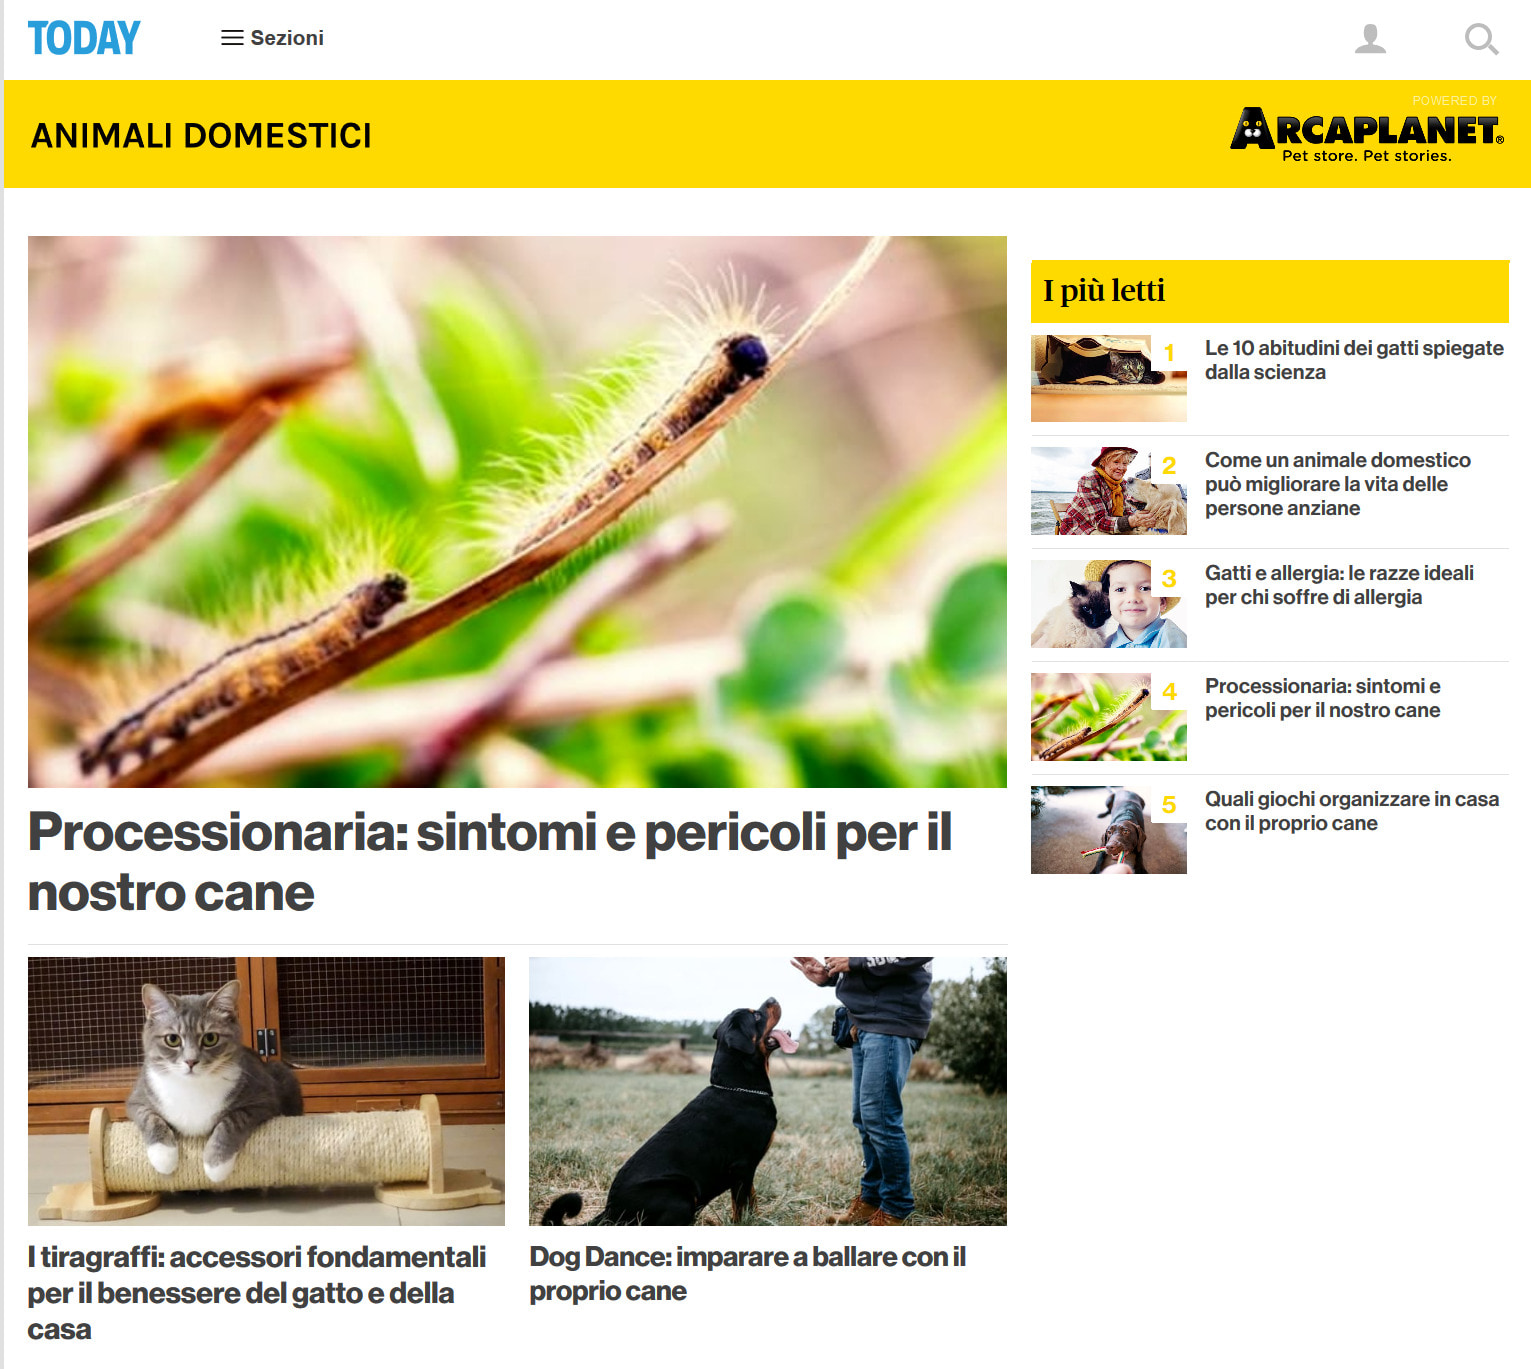 Pets_Channel_Arcaplanet_Today_Desktop